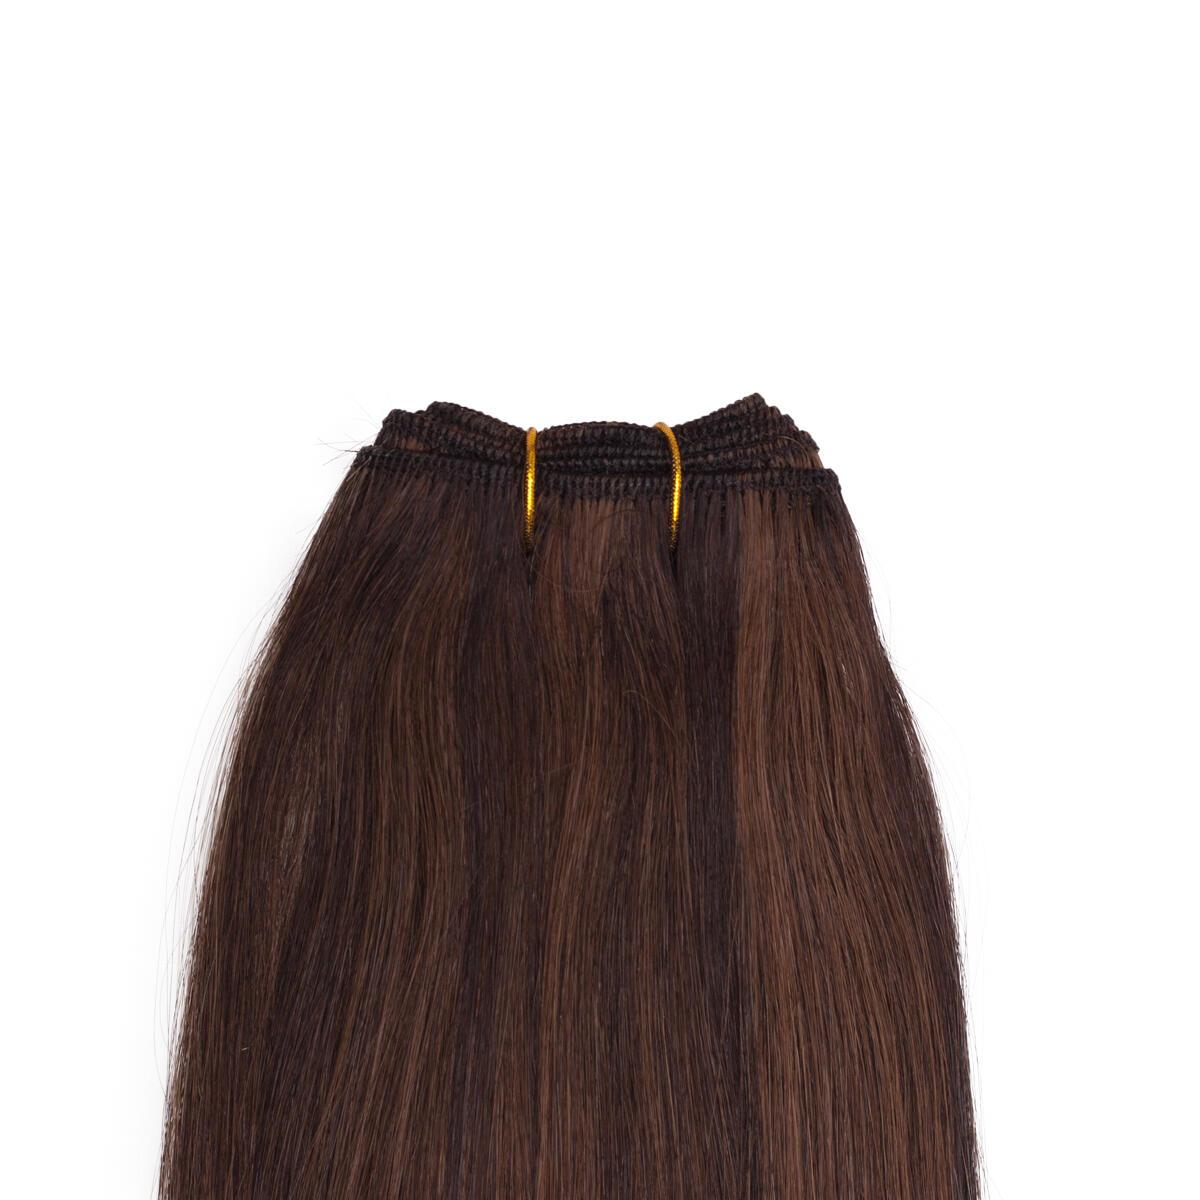 Hair Weft M2.3/5.0 Chocolate Mix 50 cm